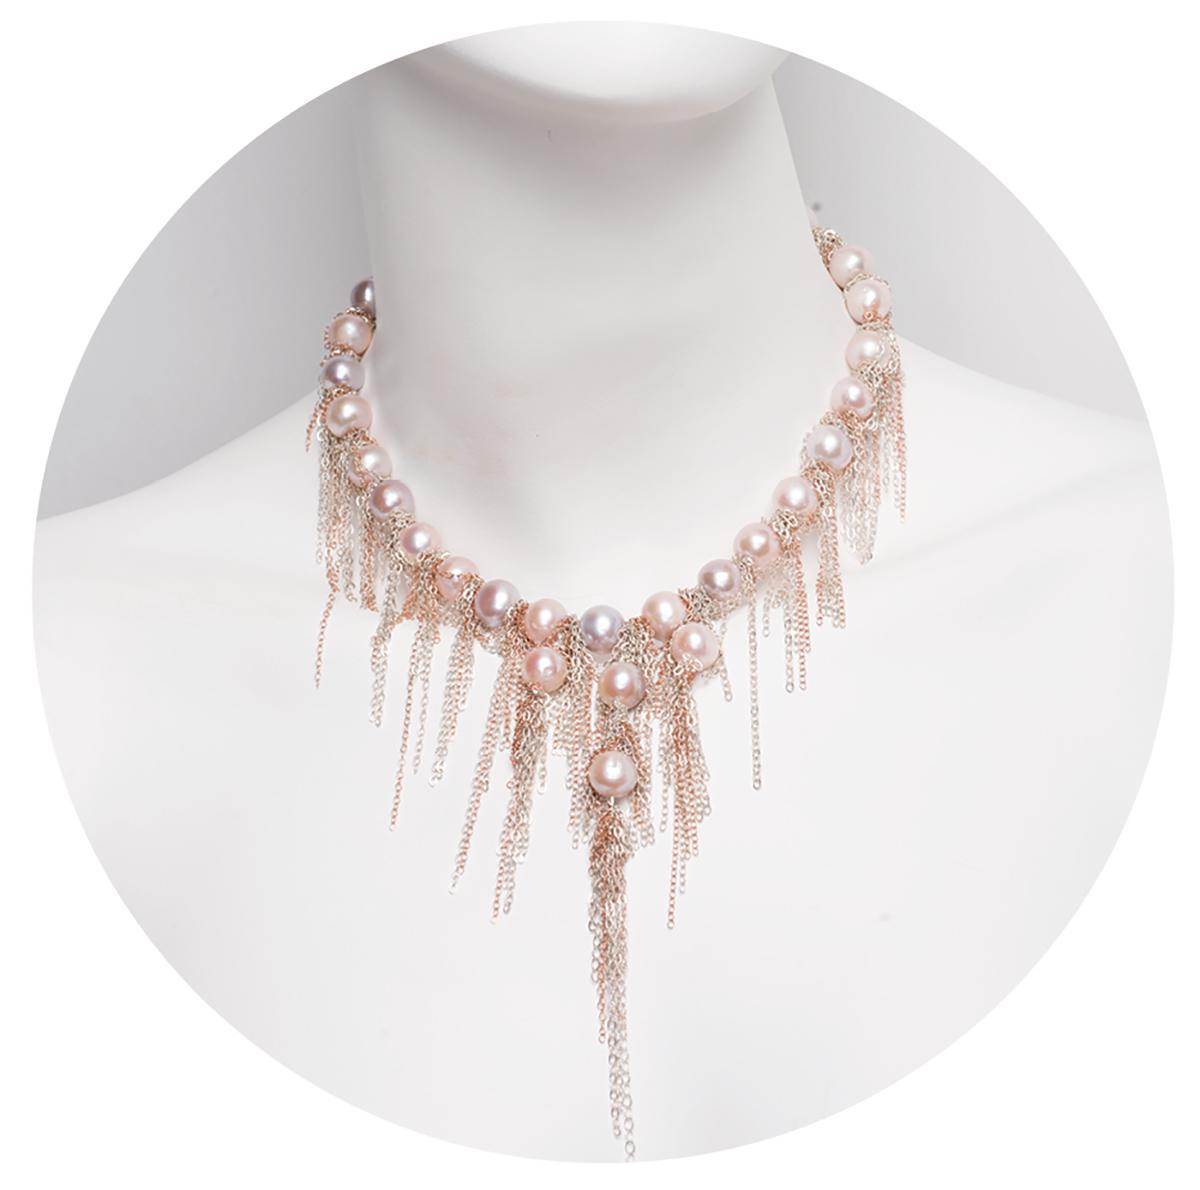 pattee lebner jewelry